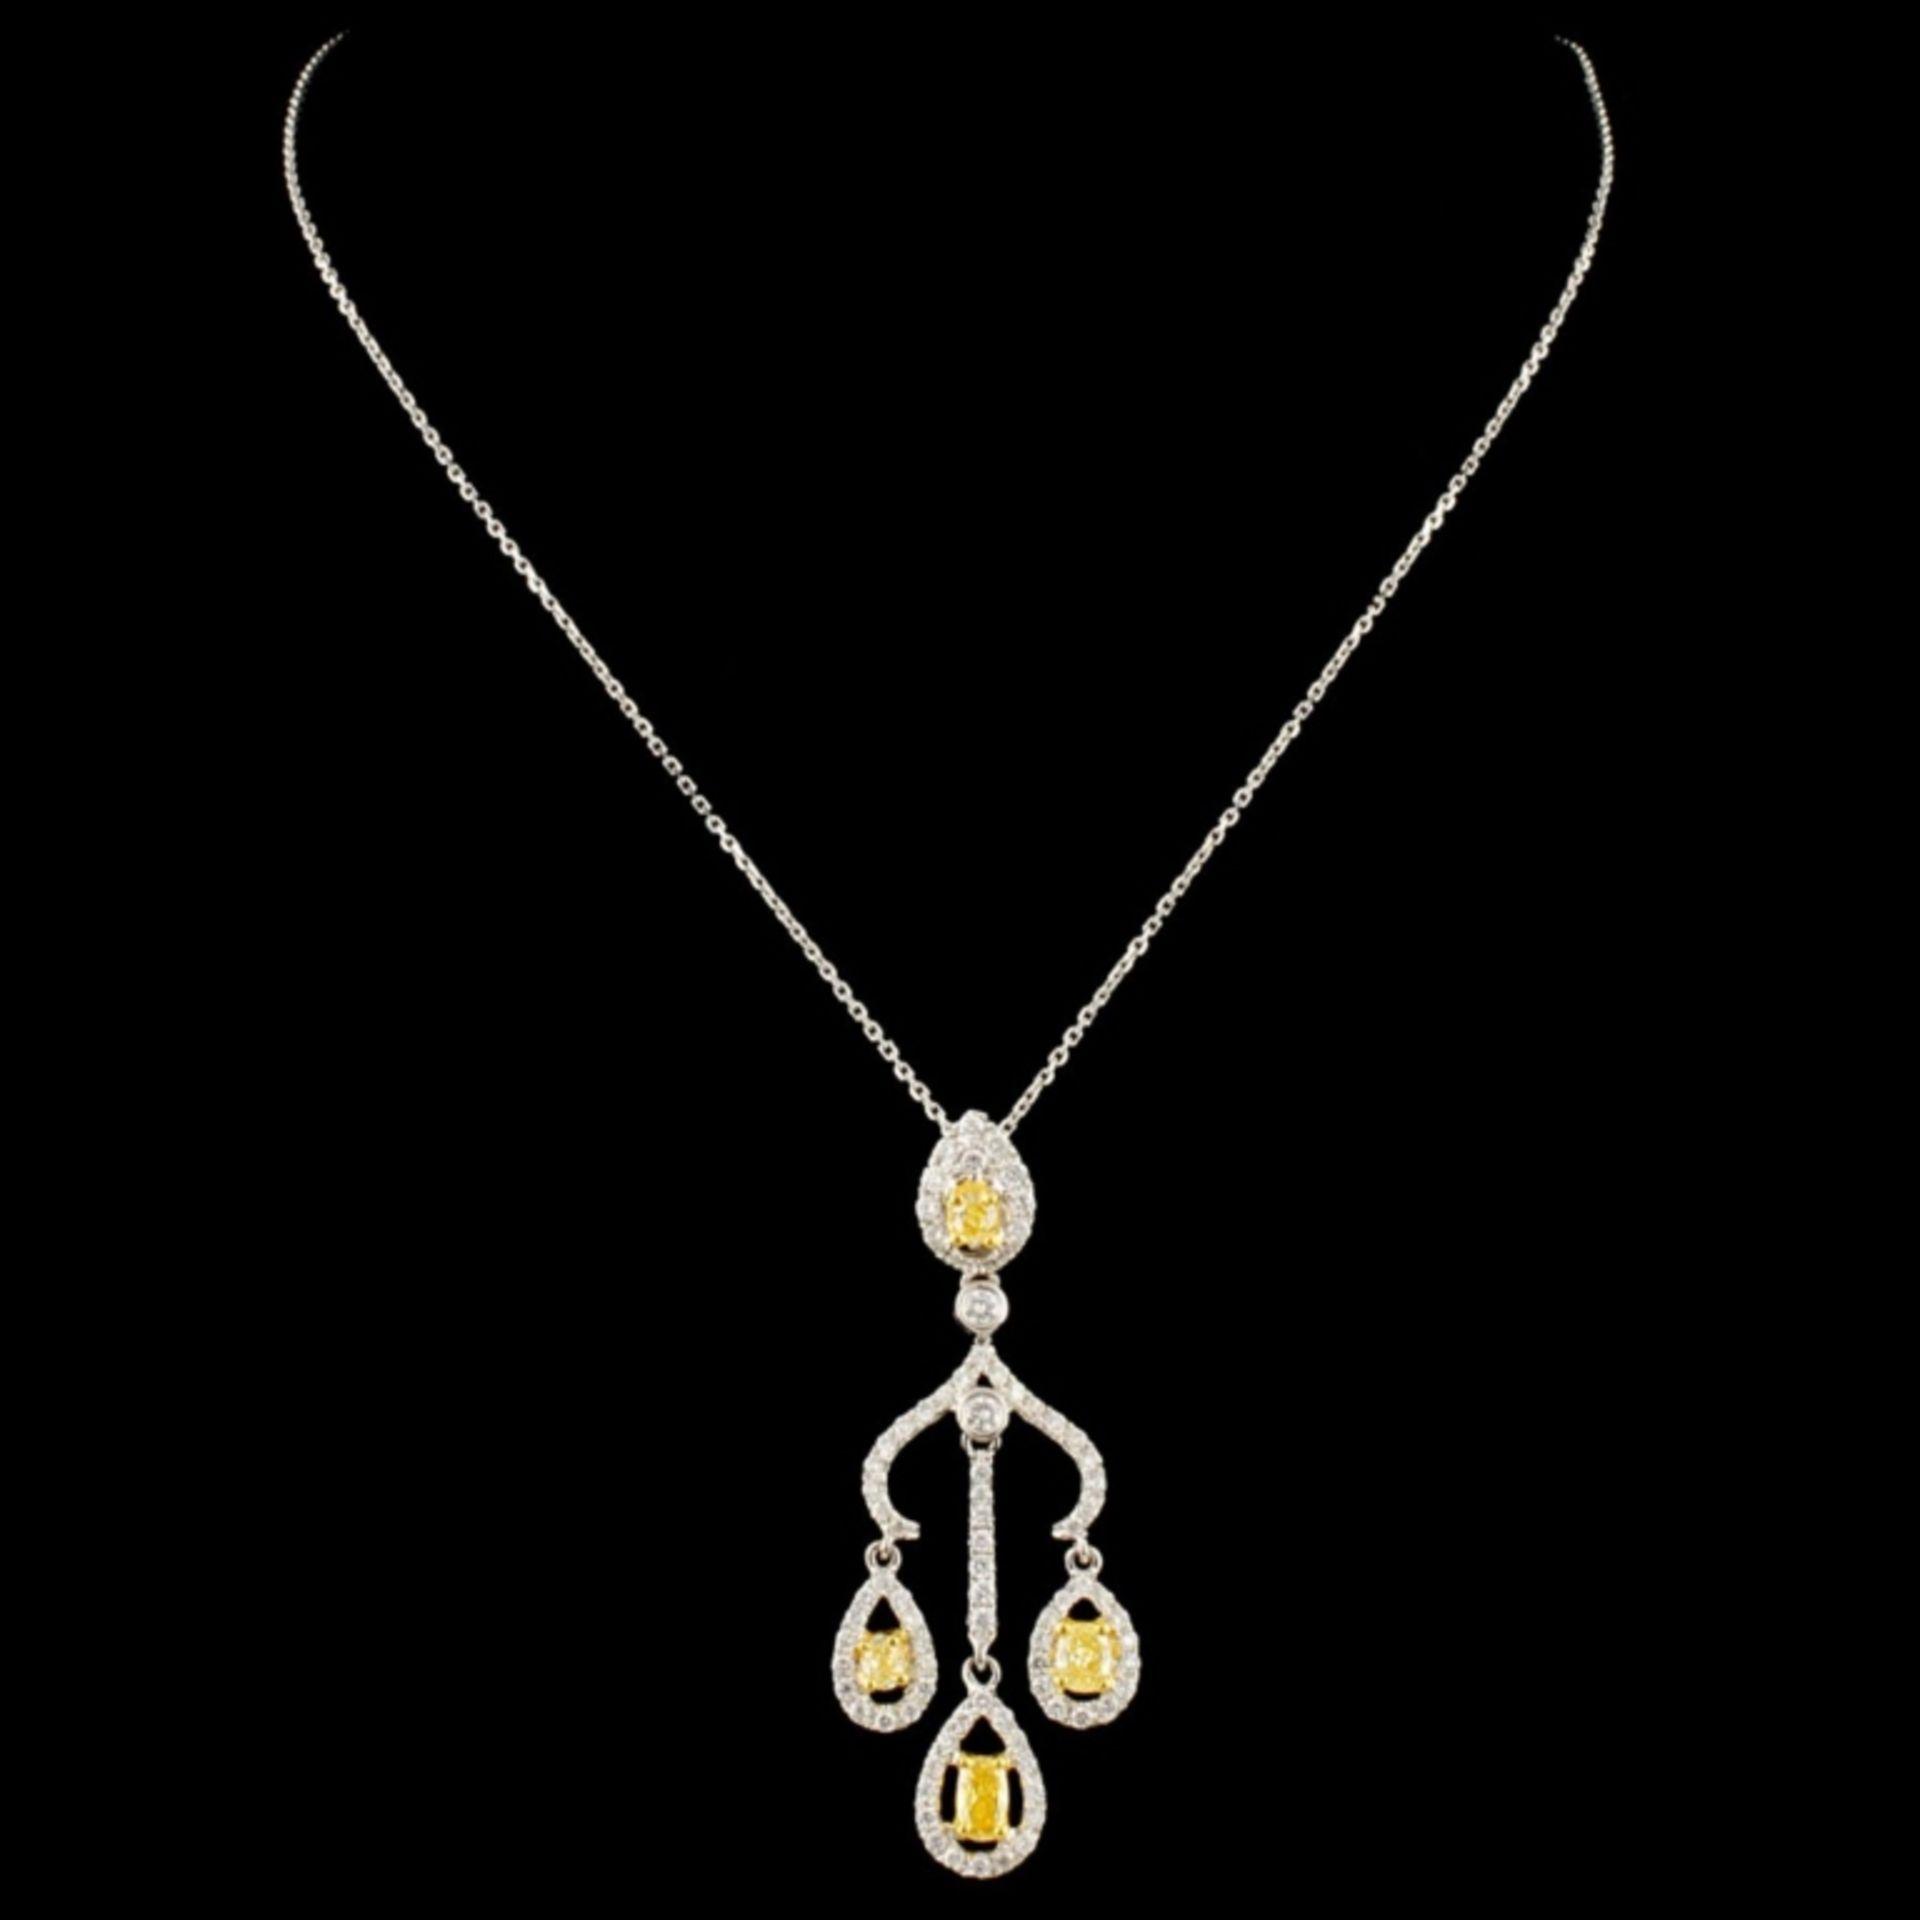 18K Gold 0.90ctw Fancy Diamond Pendant - Image 2 of 4